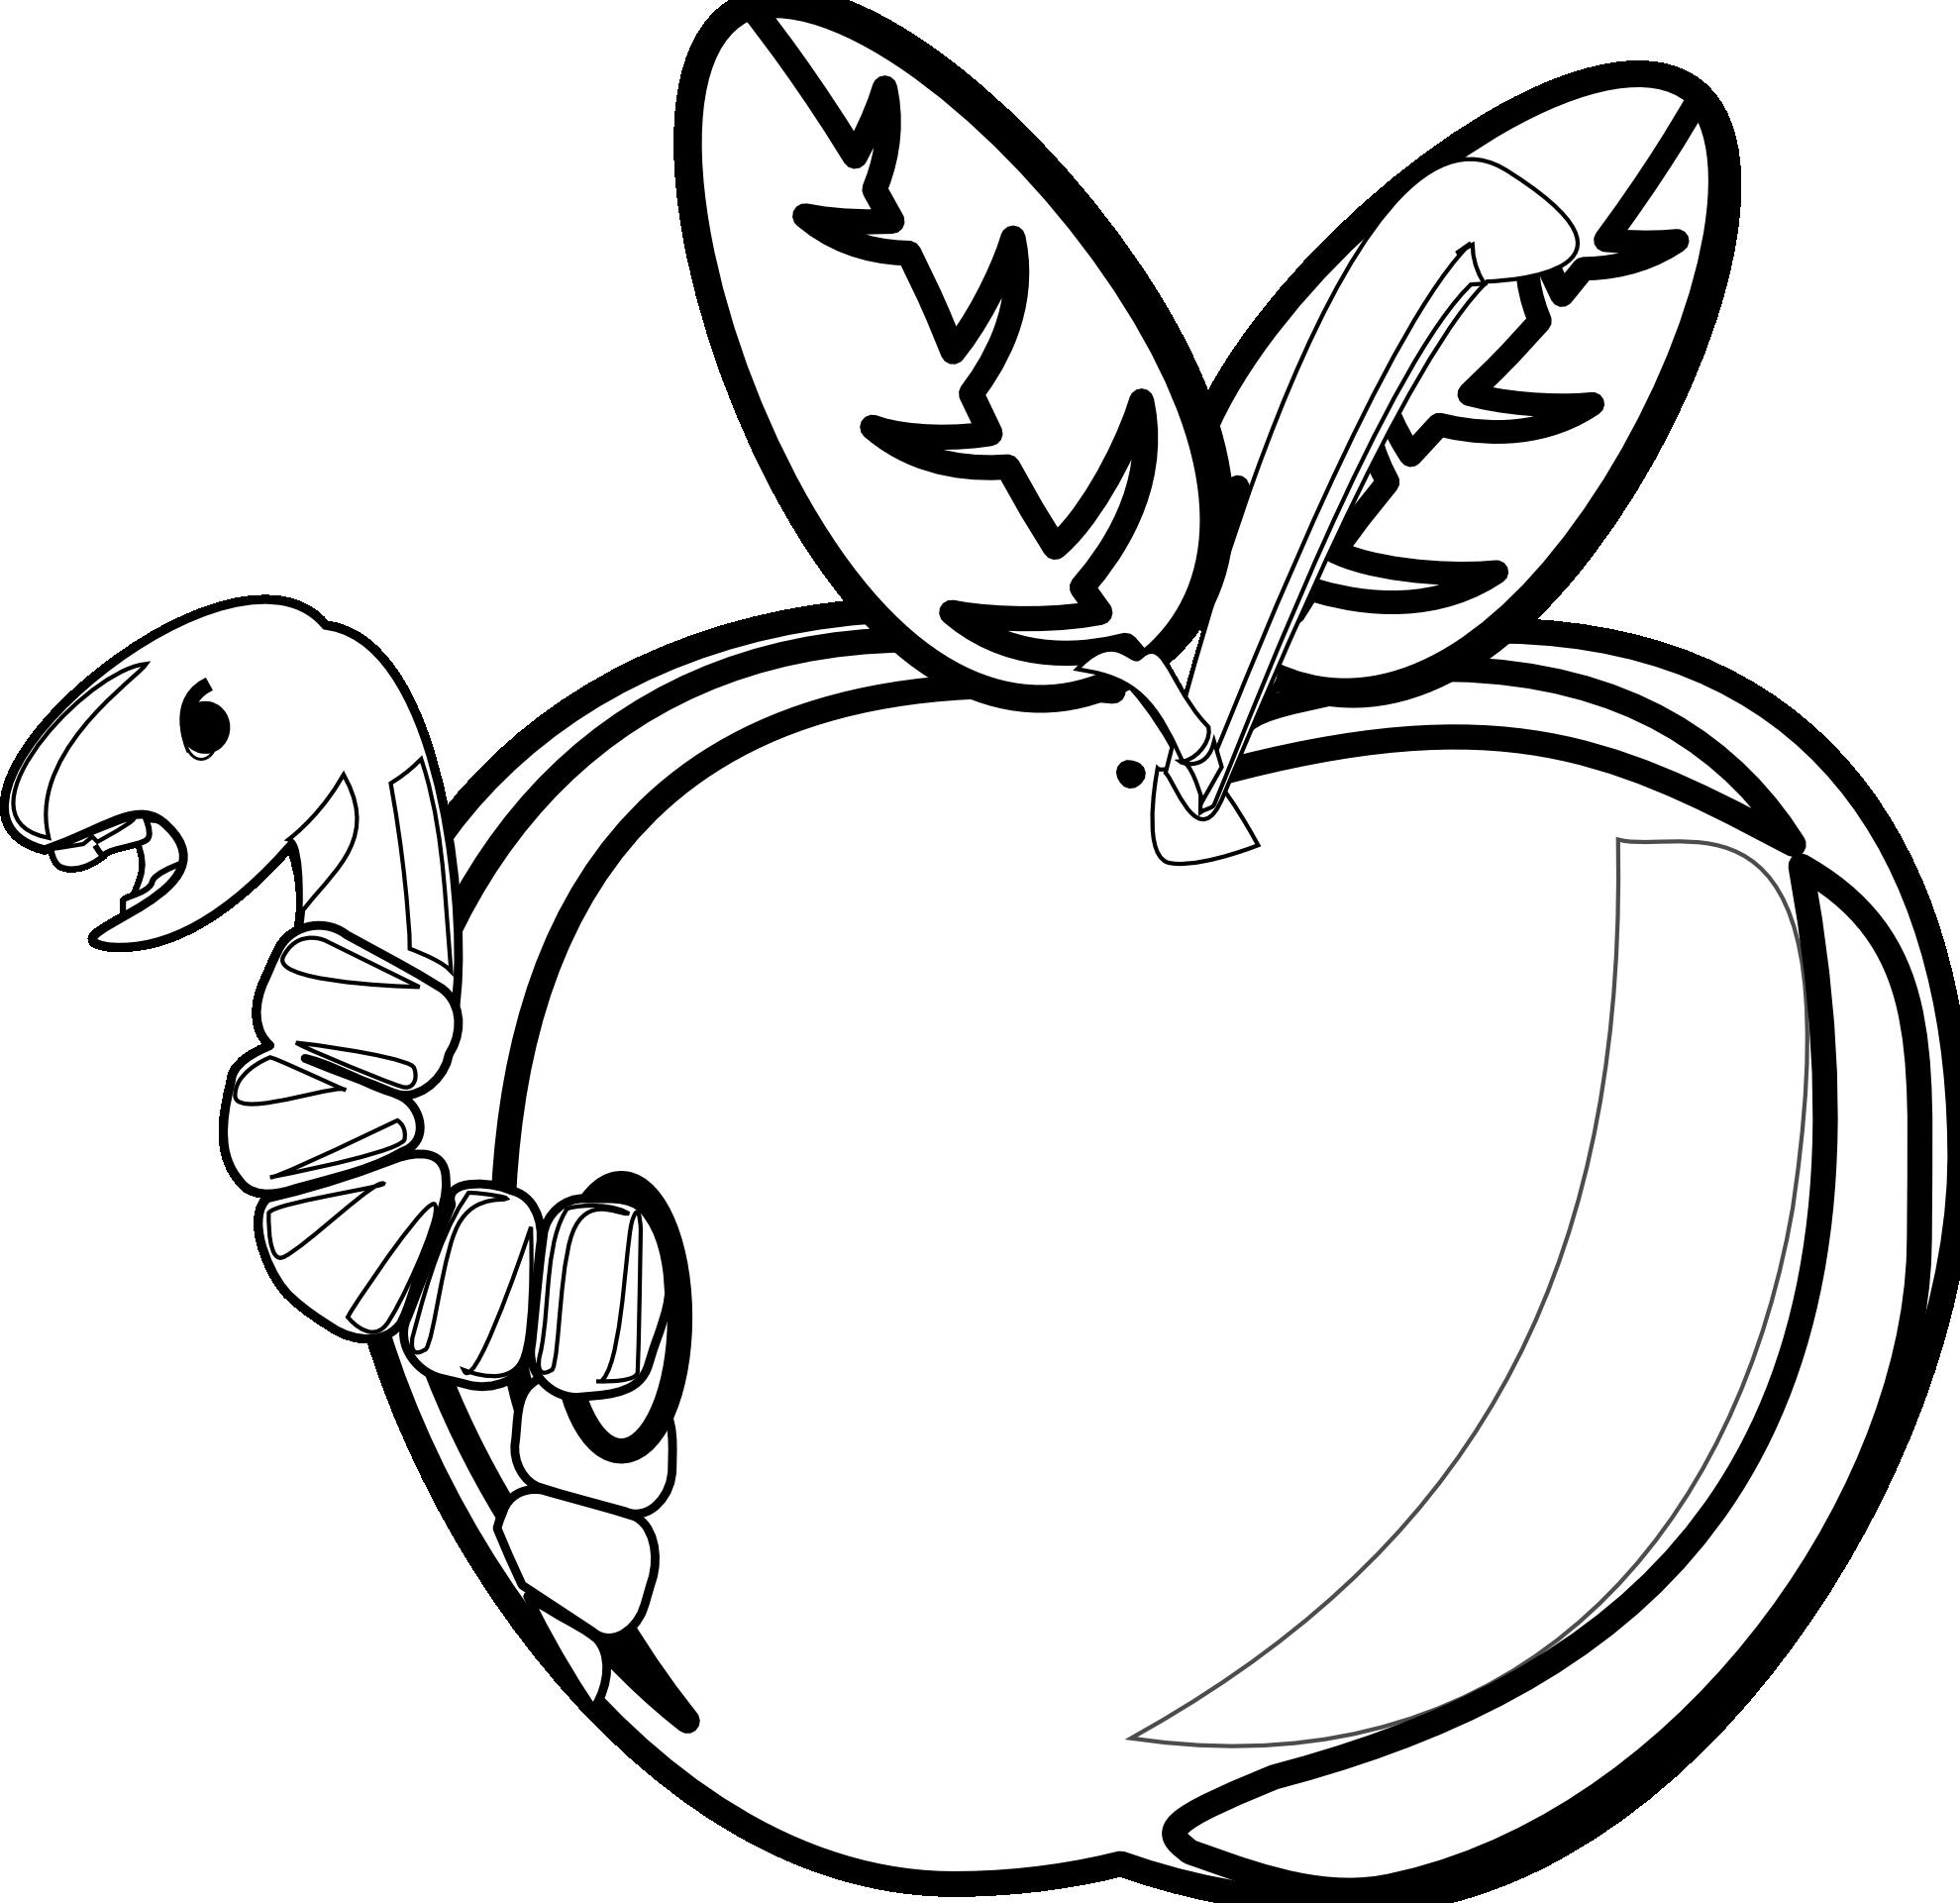 Apple  black and white apple black and white school apple clip art free 2 3